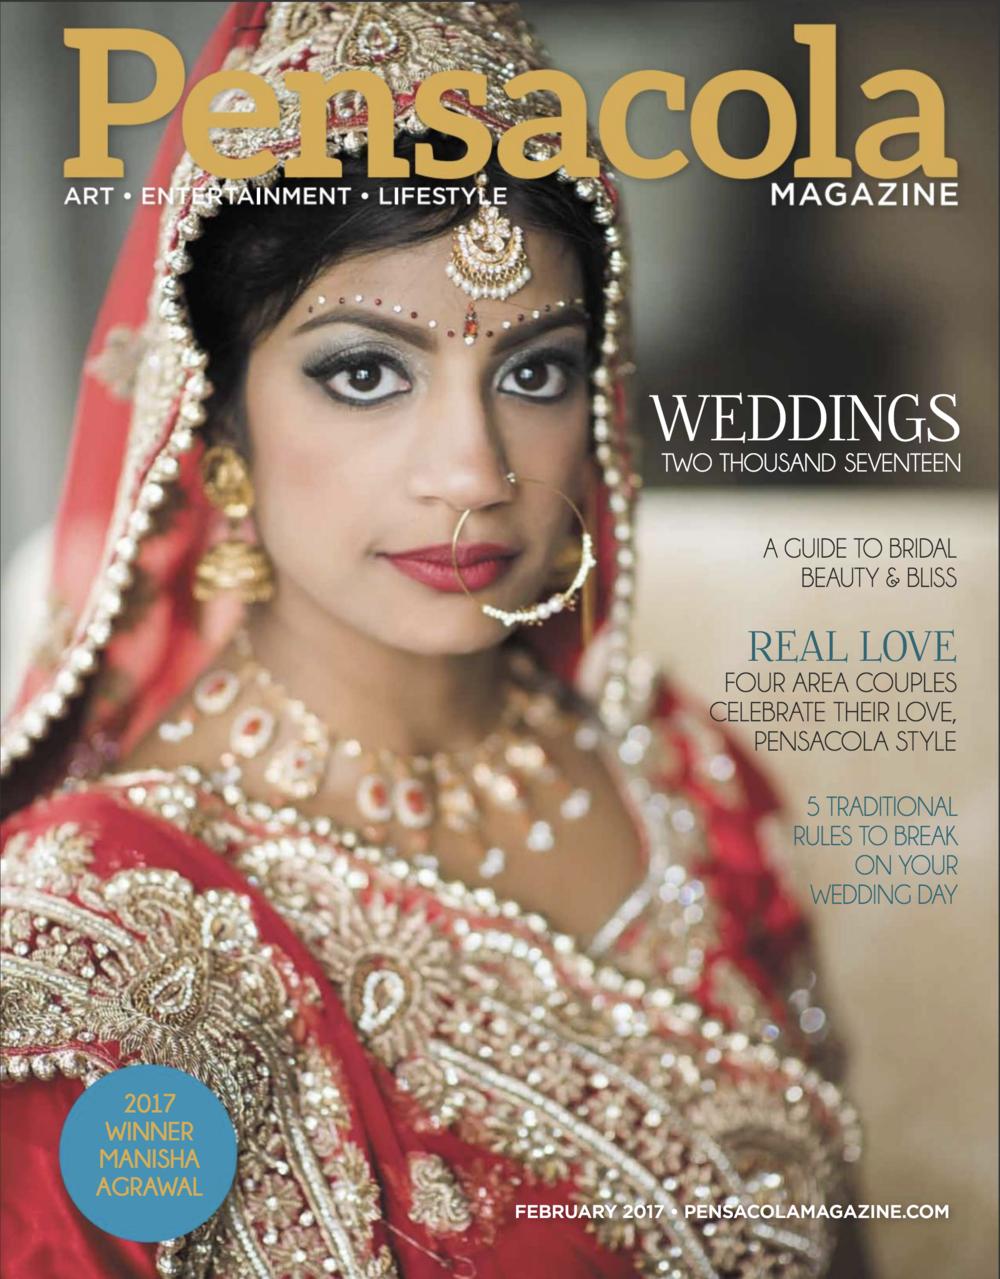 Pensacola Magazine (Cover)